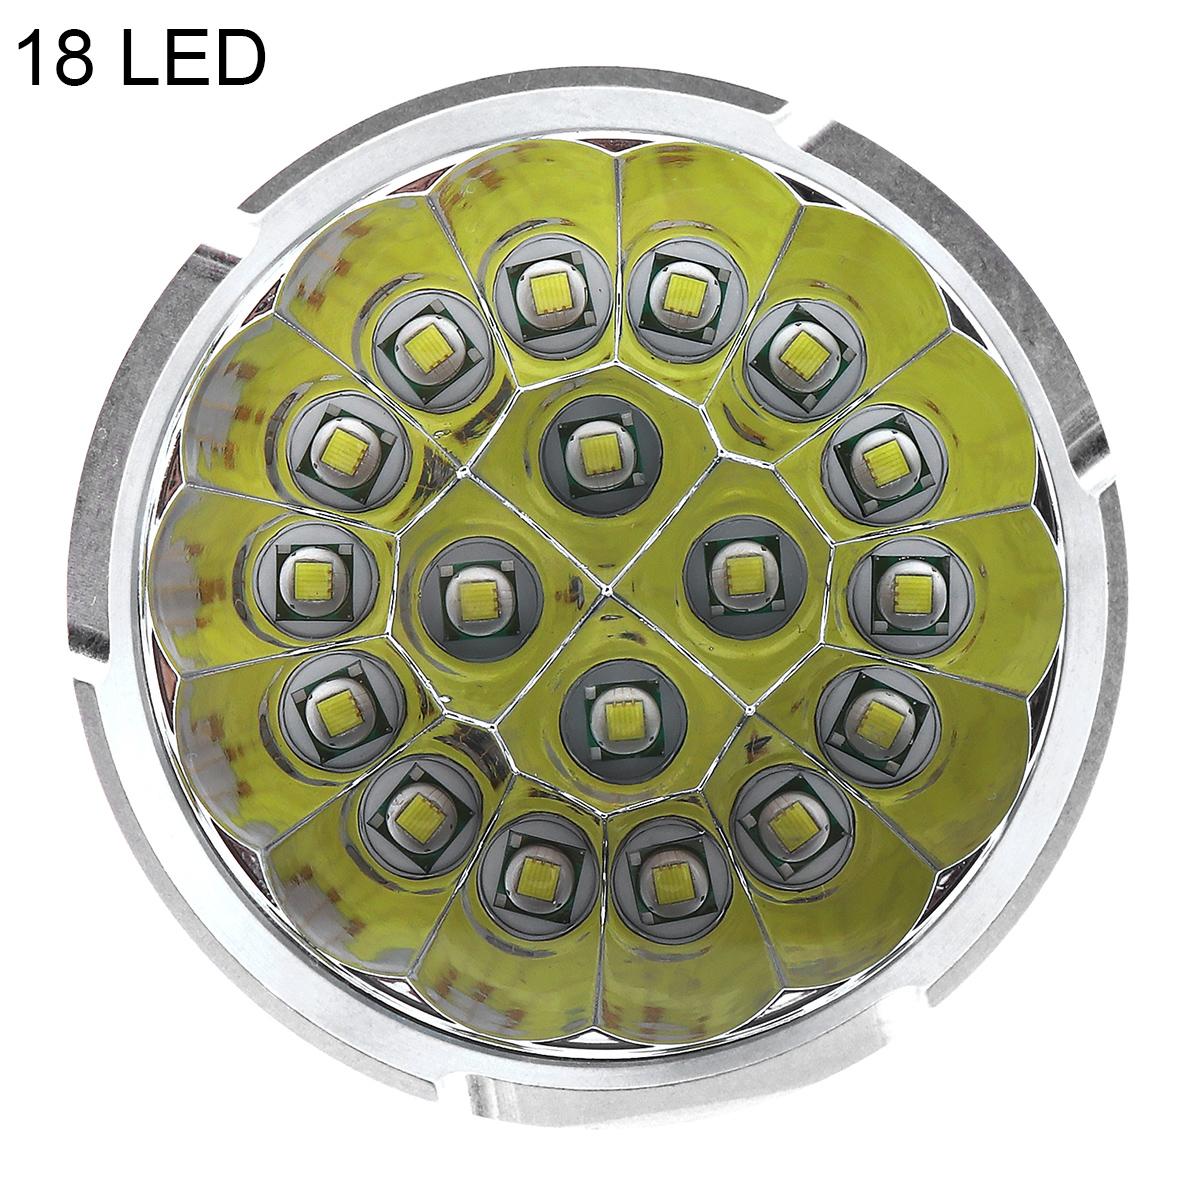 40000LM-18-x-CREE-XM-L-T6-LED-4-Modes-Flashlight-Torch-4-x-18650-Hunting-Lamp thumbnail 2